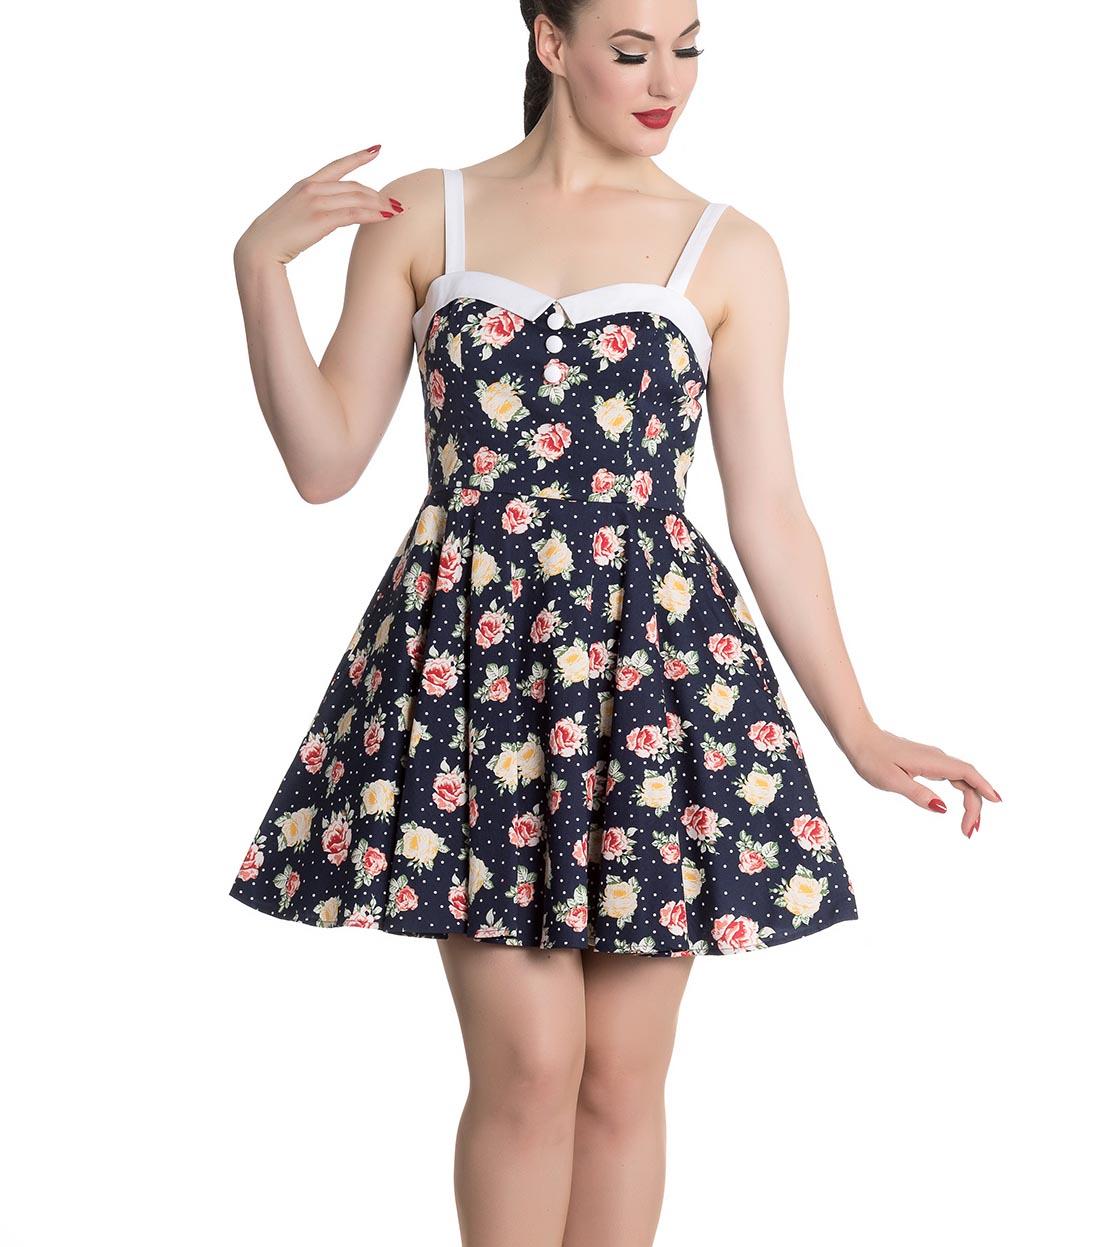 Hell-Bunny-Navy-Blue-Floral-Roses-Flowers-Mini-Dress-EMMA-Polka-Dot-All-Sizes thumbnail 11